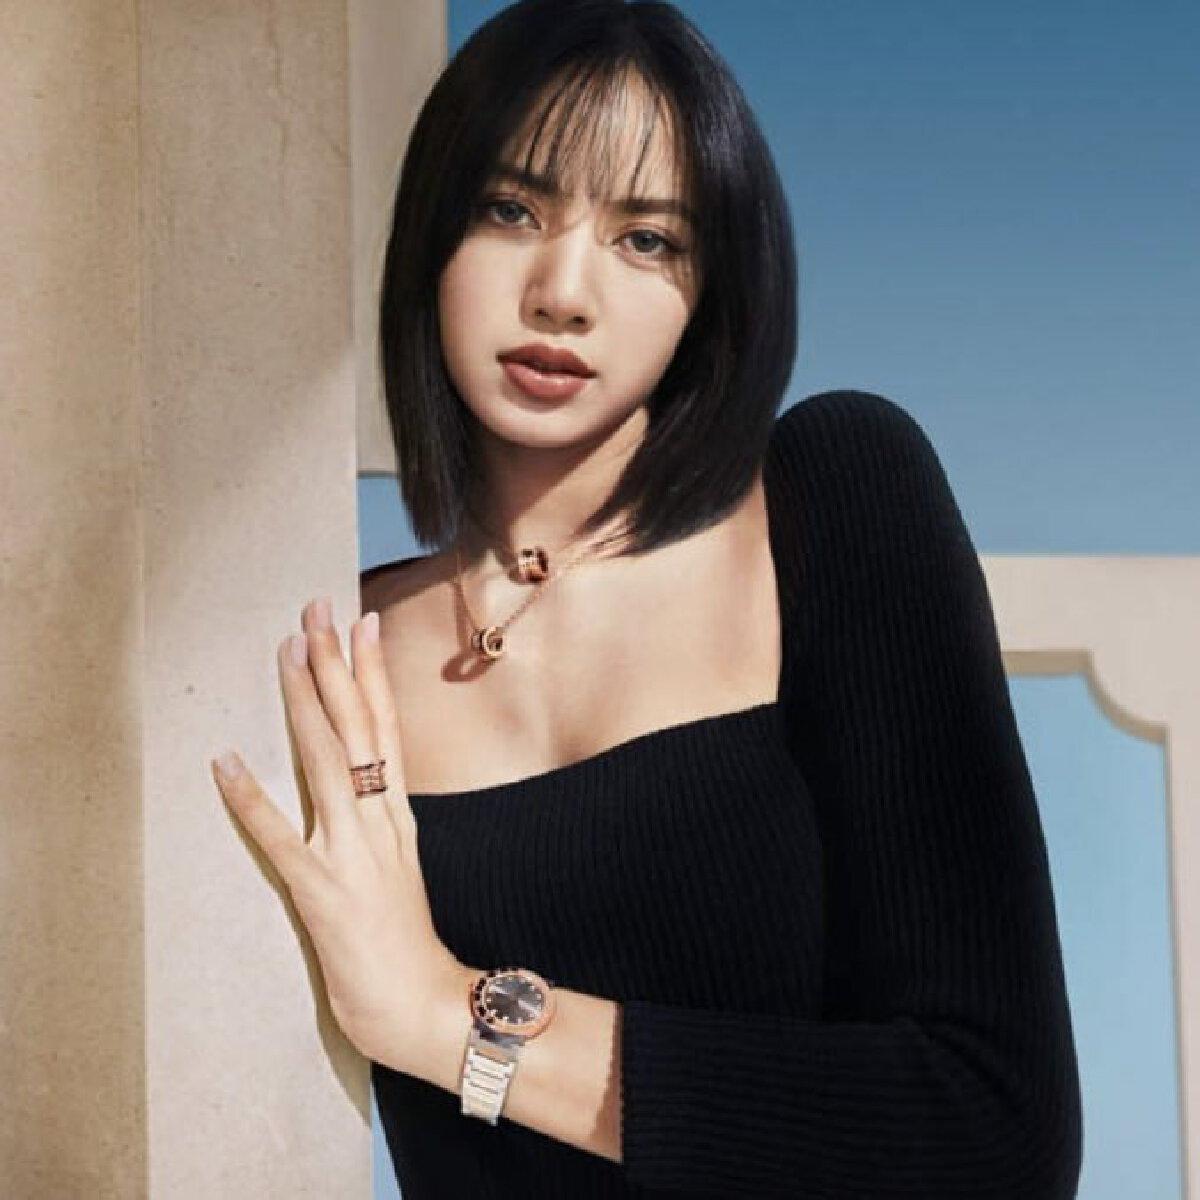 YG ห้าม ลิซ่า  BLACKPINK  ร่วมงาน BVLGARI